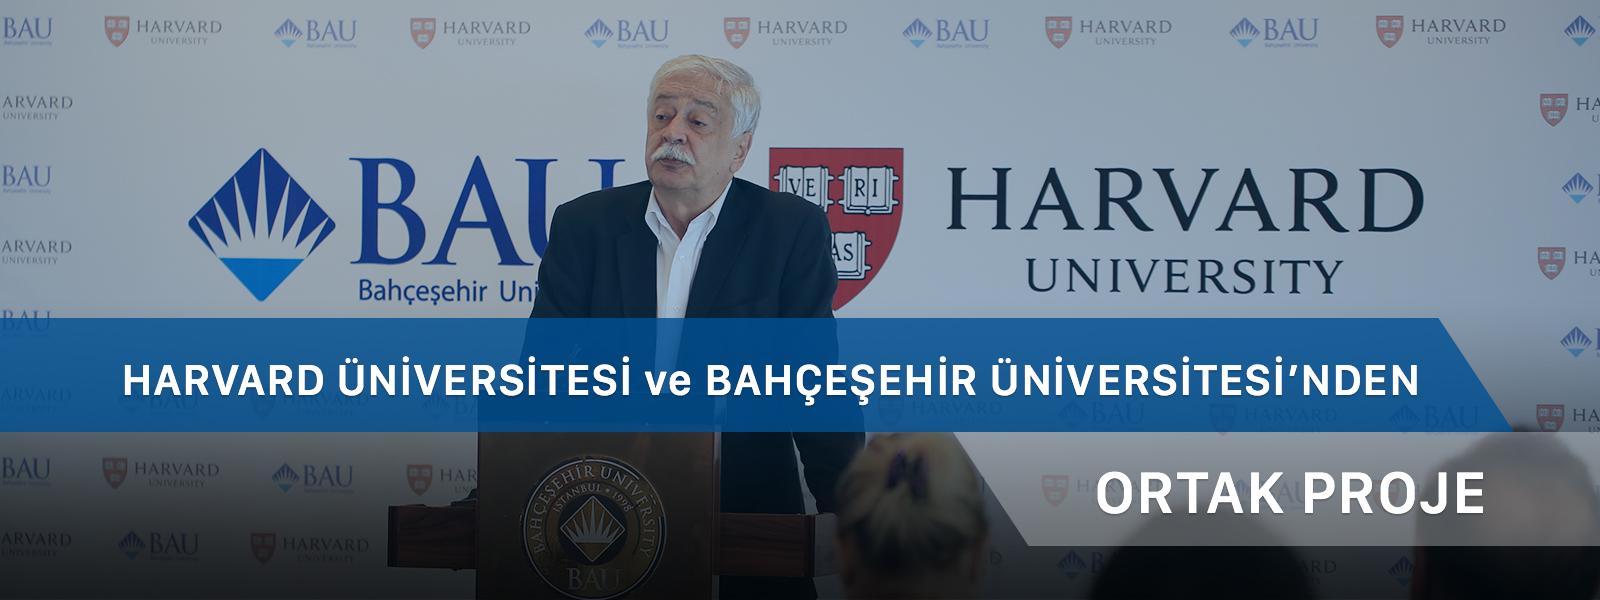 http://content.bahcesehir.edu.tr/